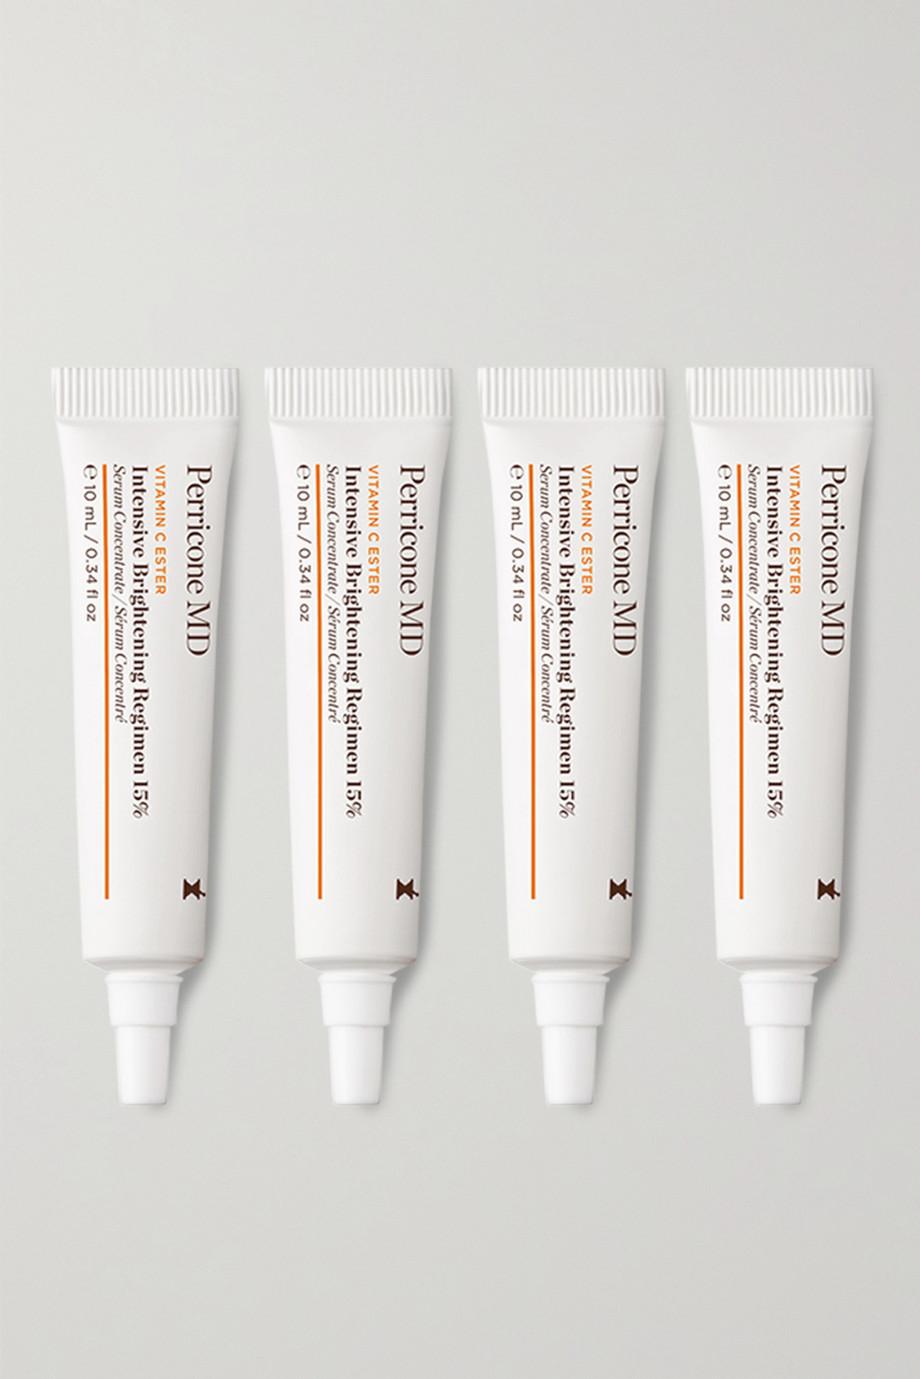 Perricone MD Vitamin C Ester Intensive Brightening Regimen 15 %, 4 x 10 ml – Set aus Seren